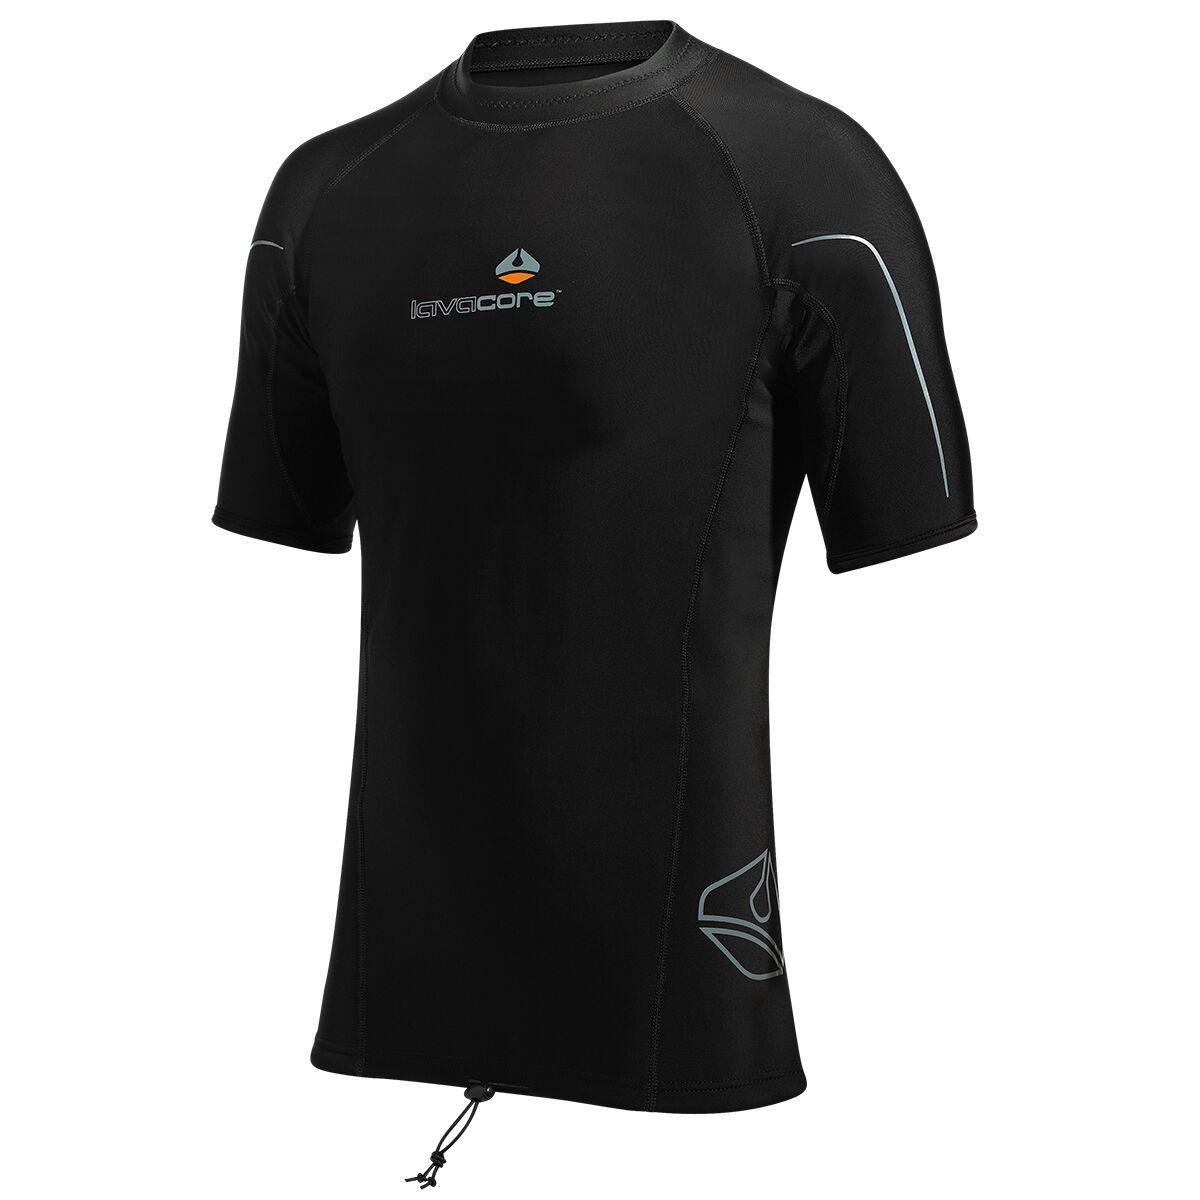 LavaCore Men's Short Sleeve Shirt Scuba Diving Surf  Wetsuit (All Sizes)  the best online store offer